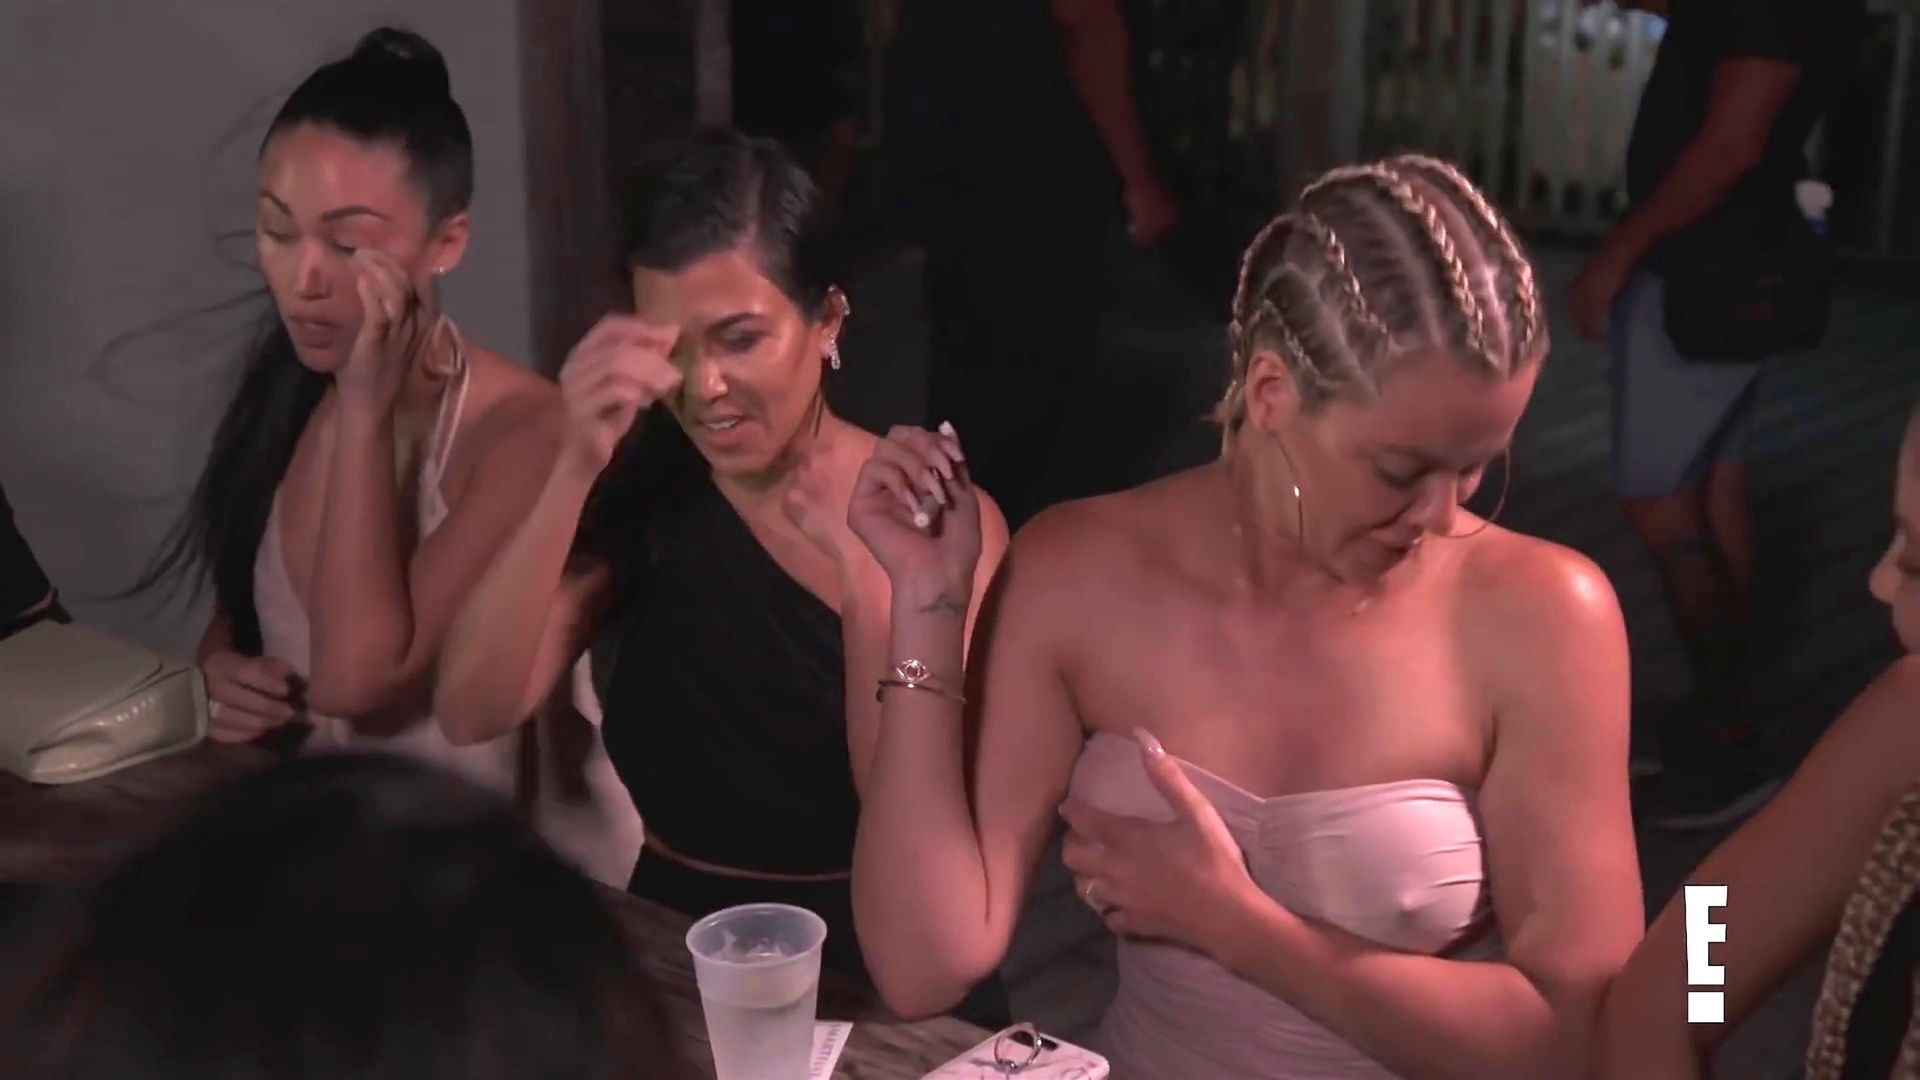 Khloé Kardashian Gets A Little Cold Without A Bra 0001